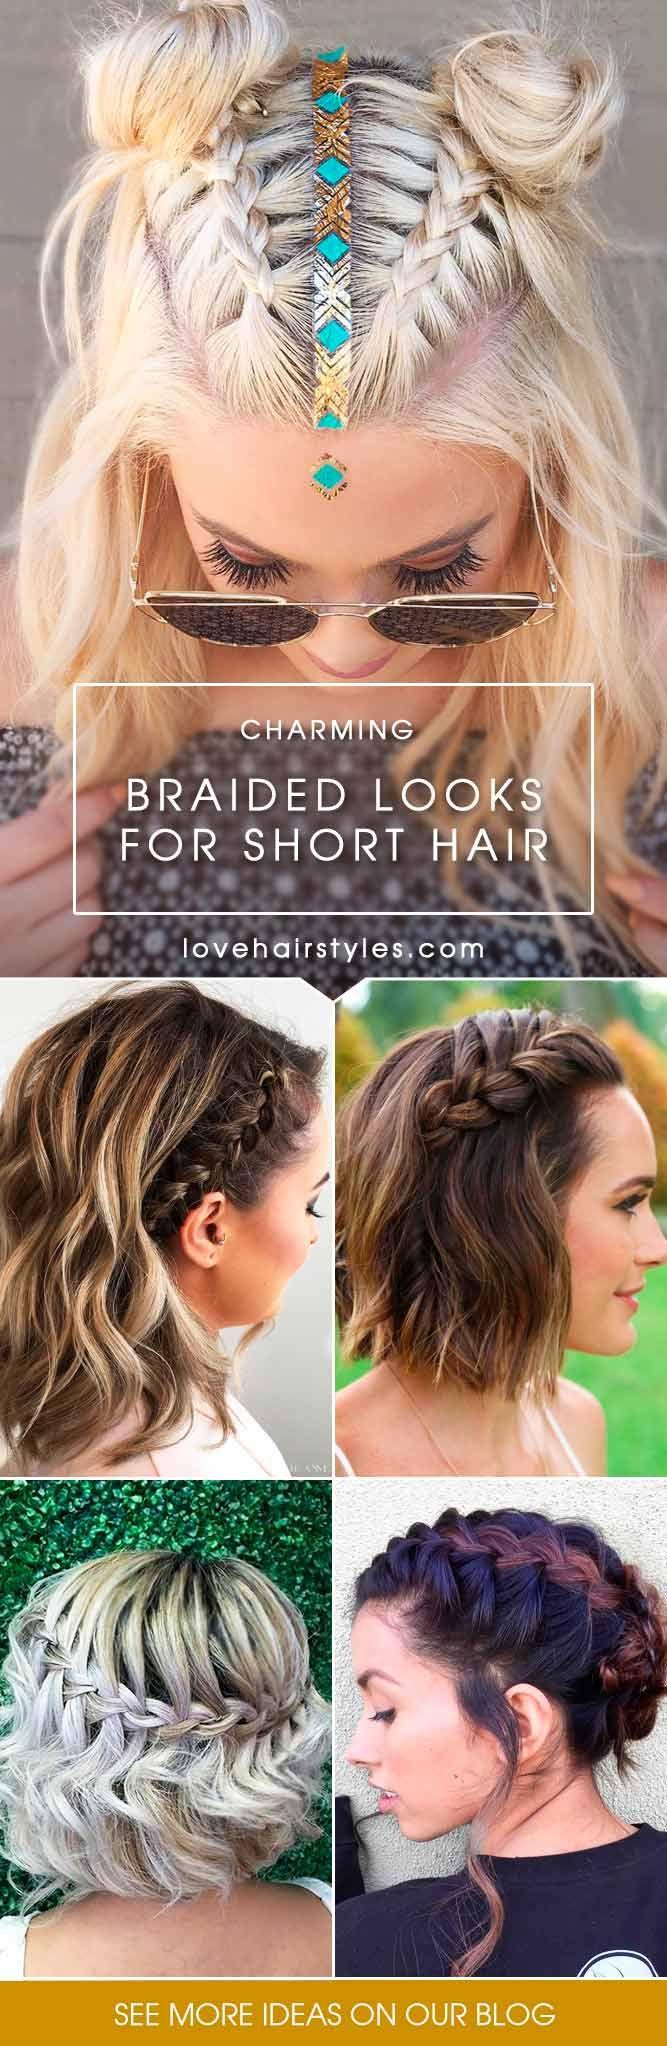 Best 25+ Braided short hair ideas on Pinterest | Braids for short ...